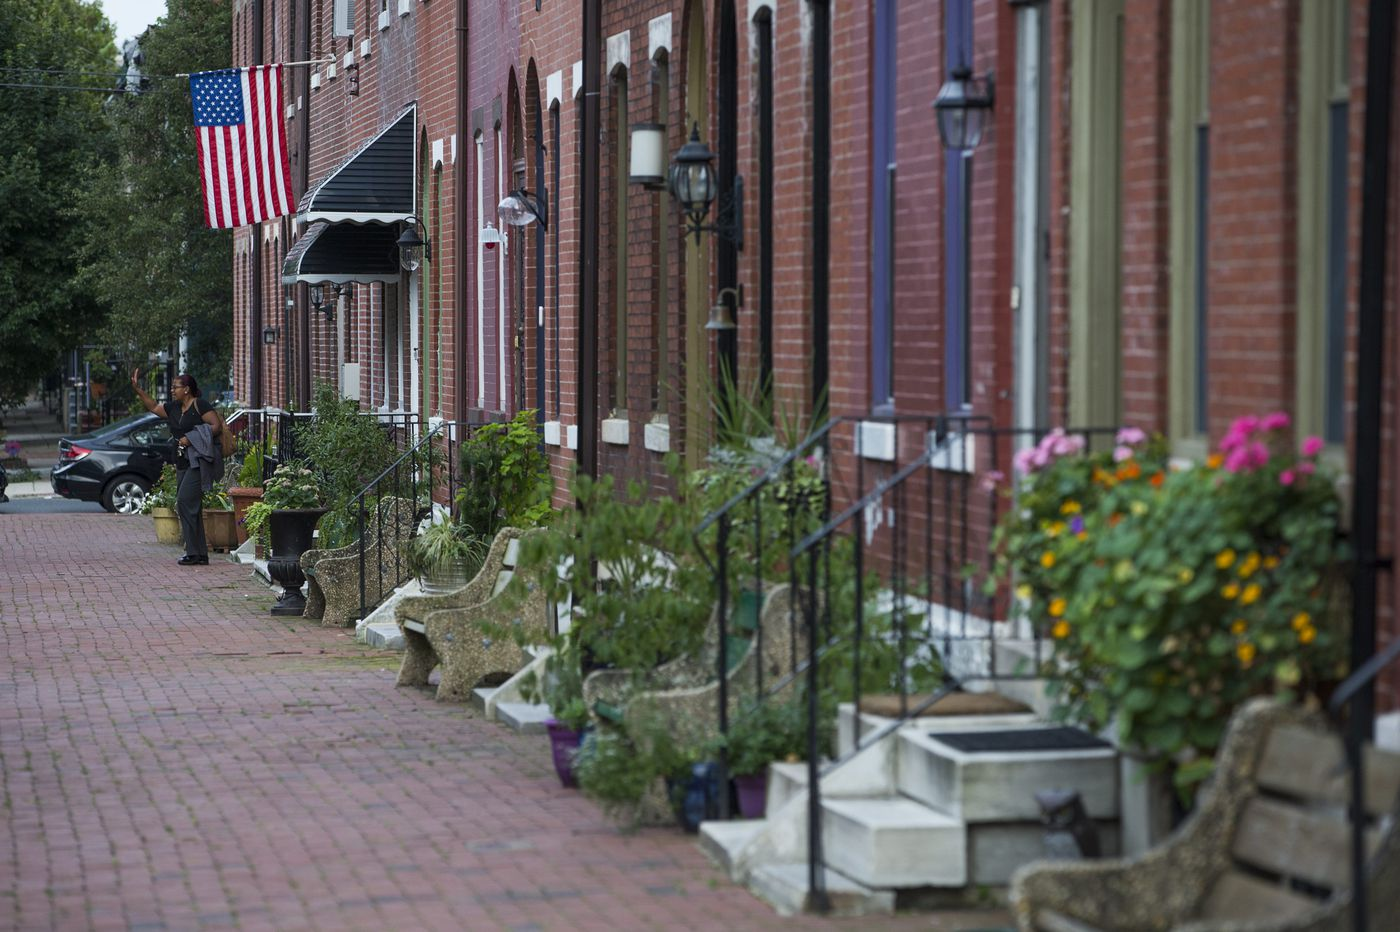 Have a tax abatement? Donate it to Philly's public schools, nonprofit urges.